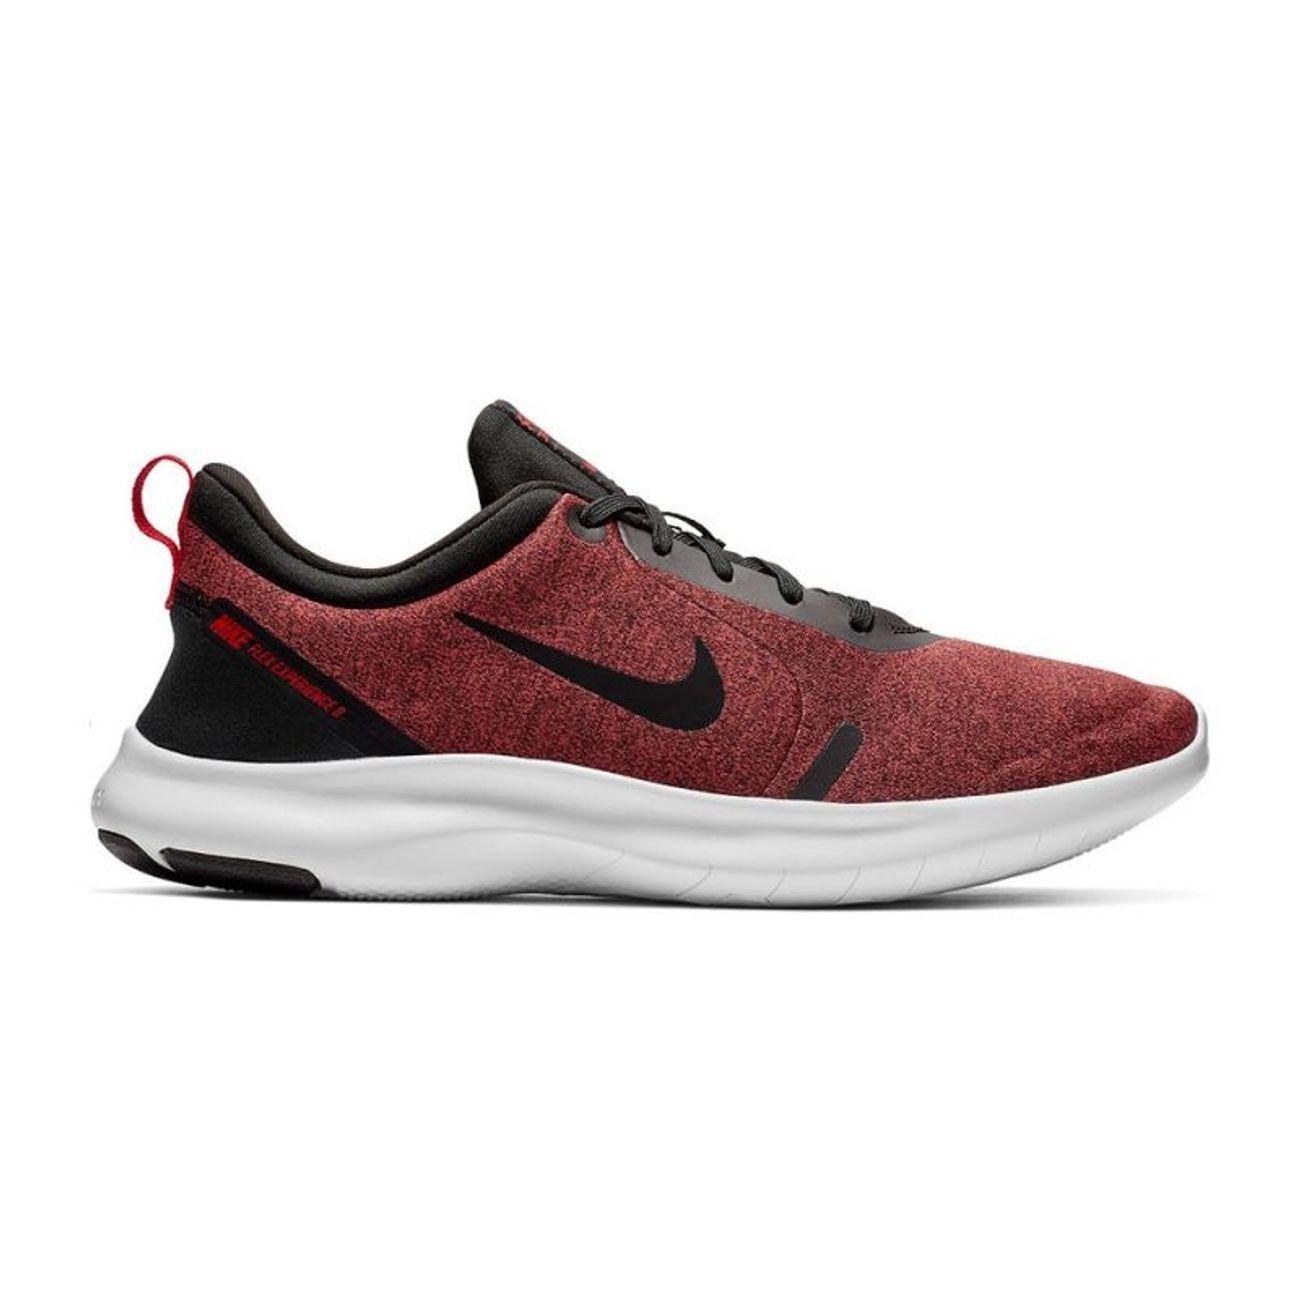 Niaj5900 Flex Experience Noir Padel Adulte Nike 001 Rouge Rn 8 ONmv8n0w